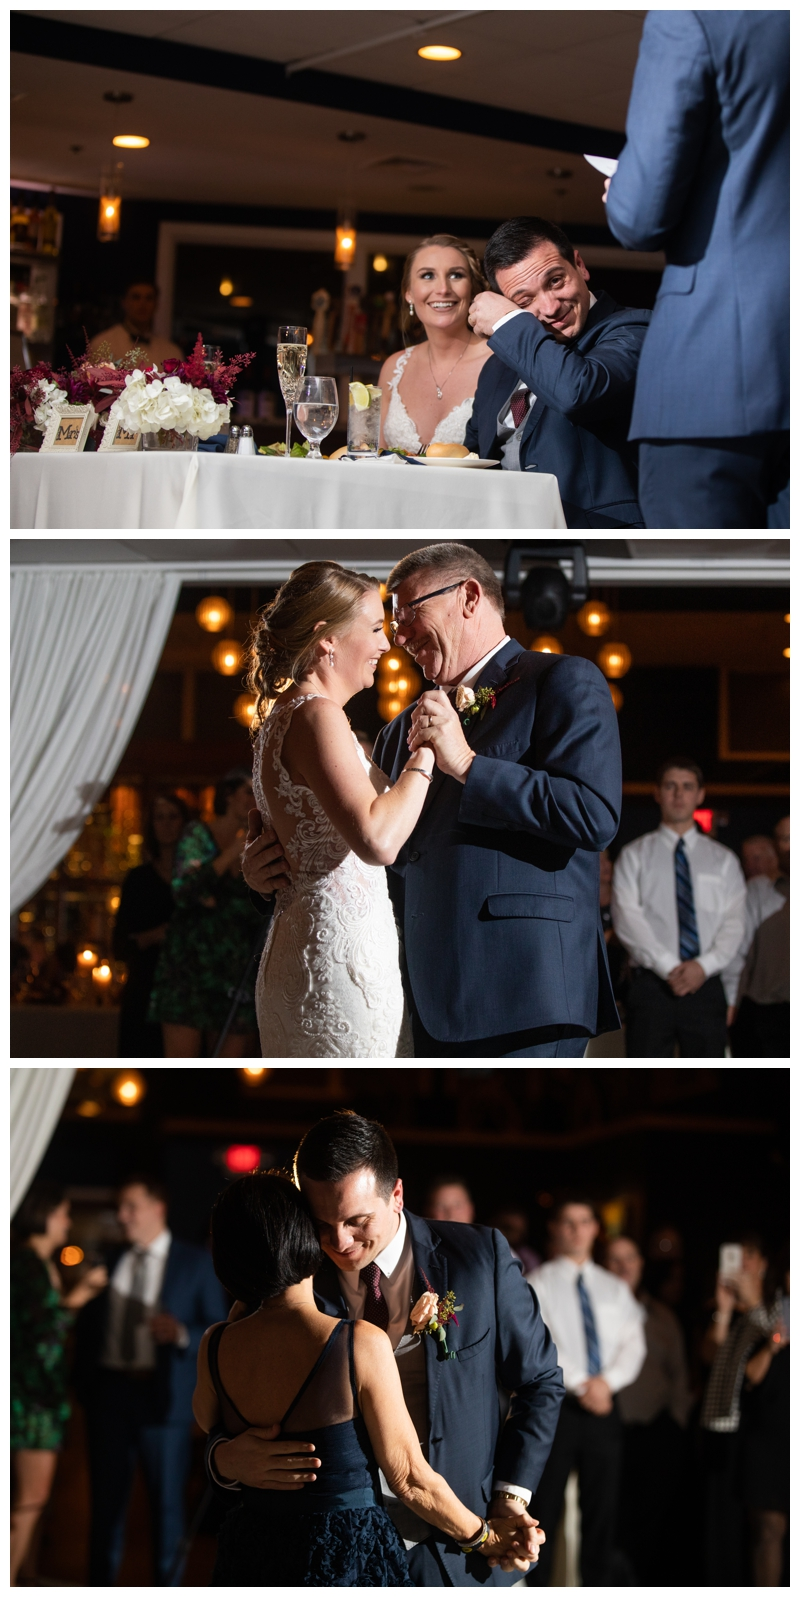 windrift-wedding-styled-pink-photography-13.jpg